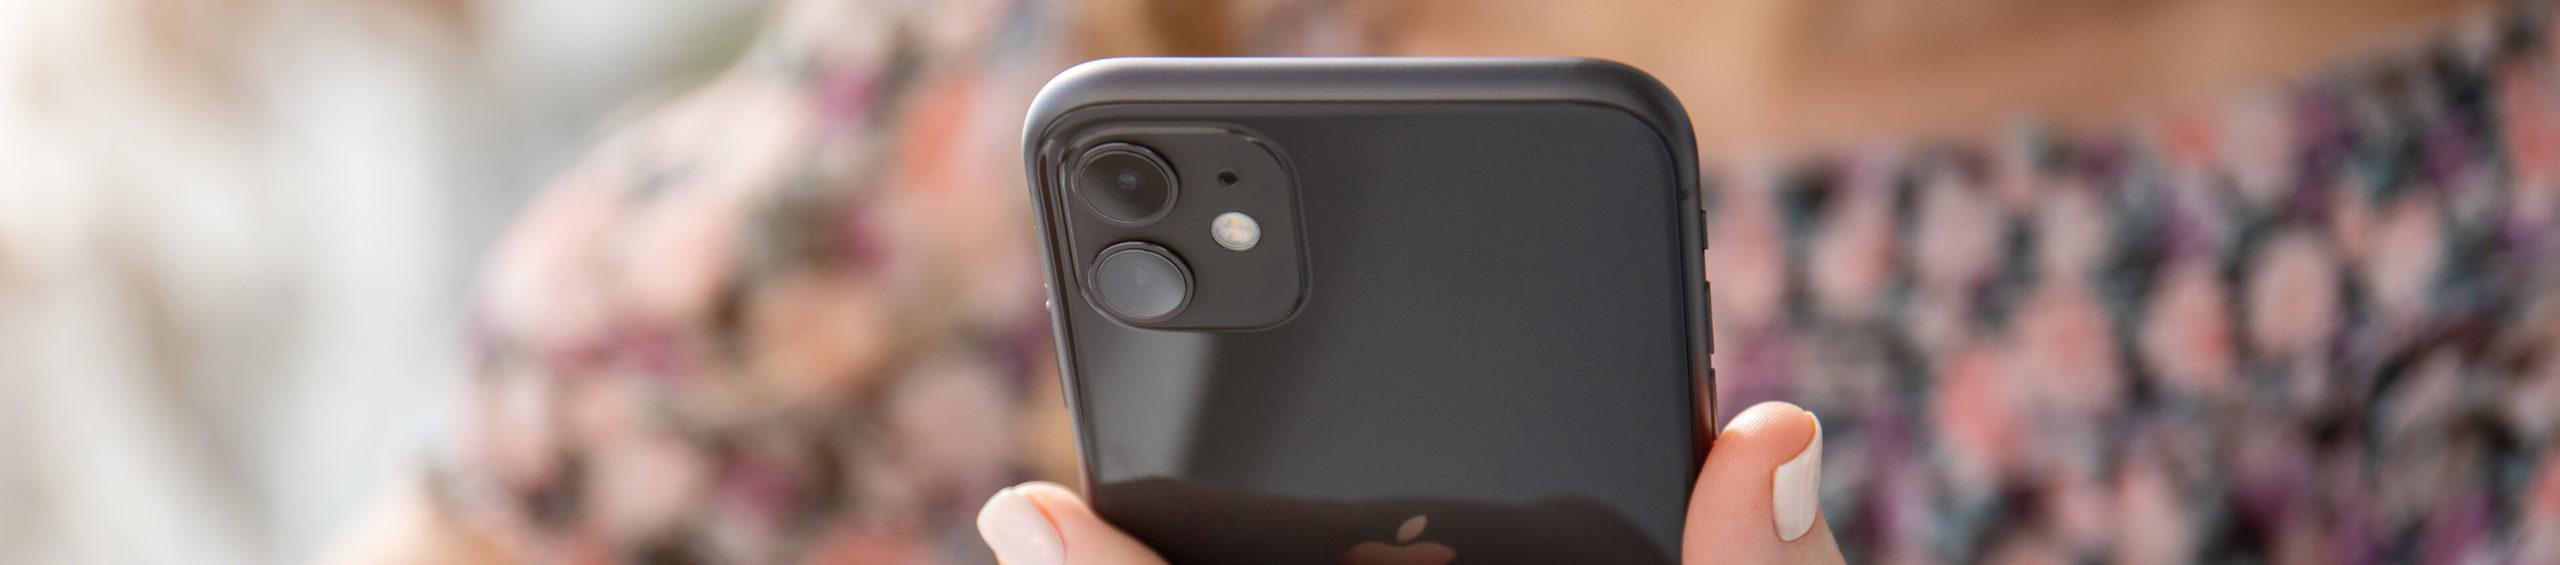 iPhone Black-Friday